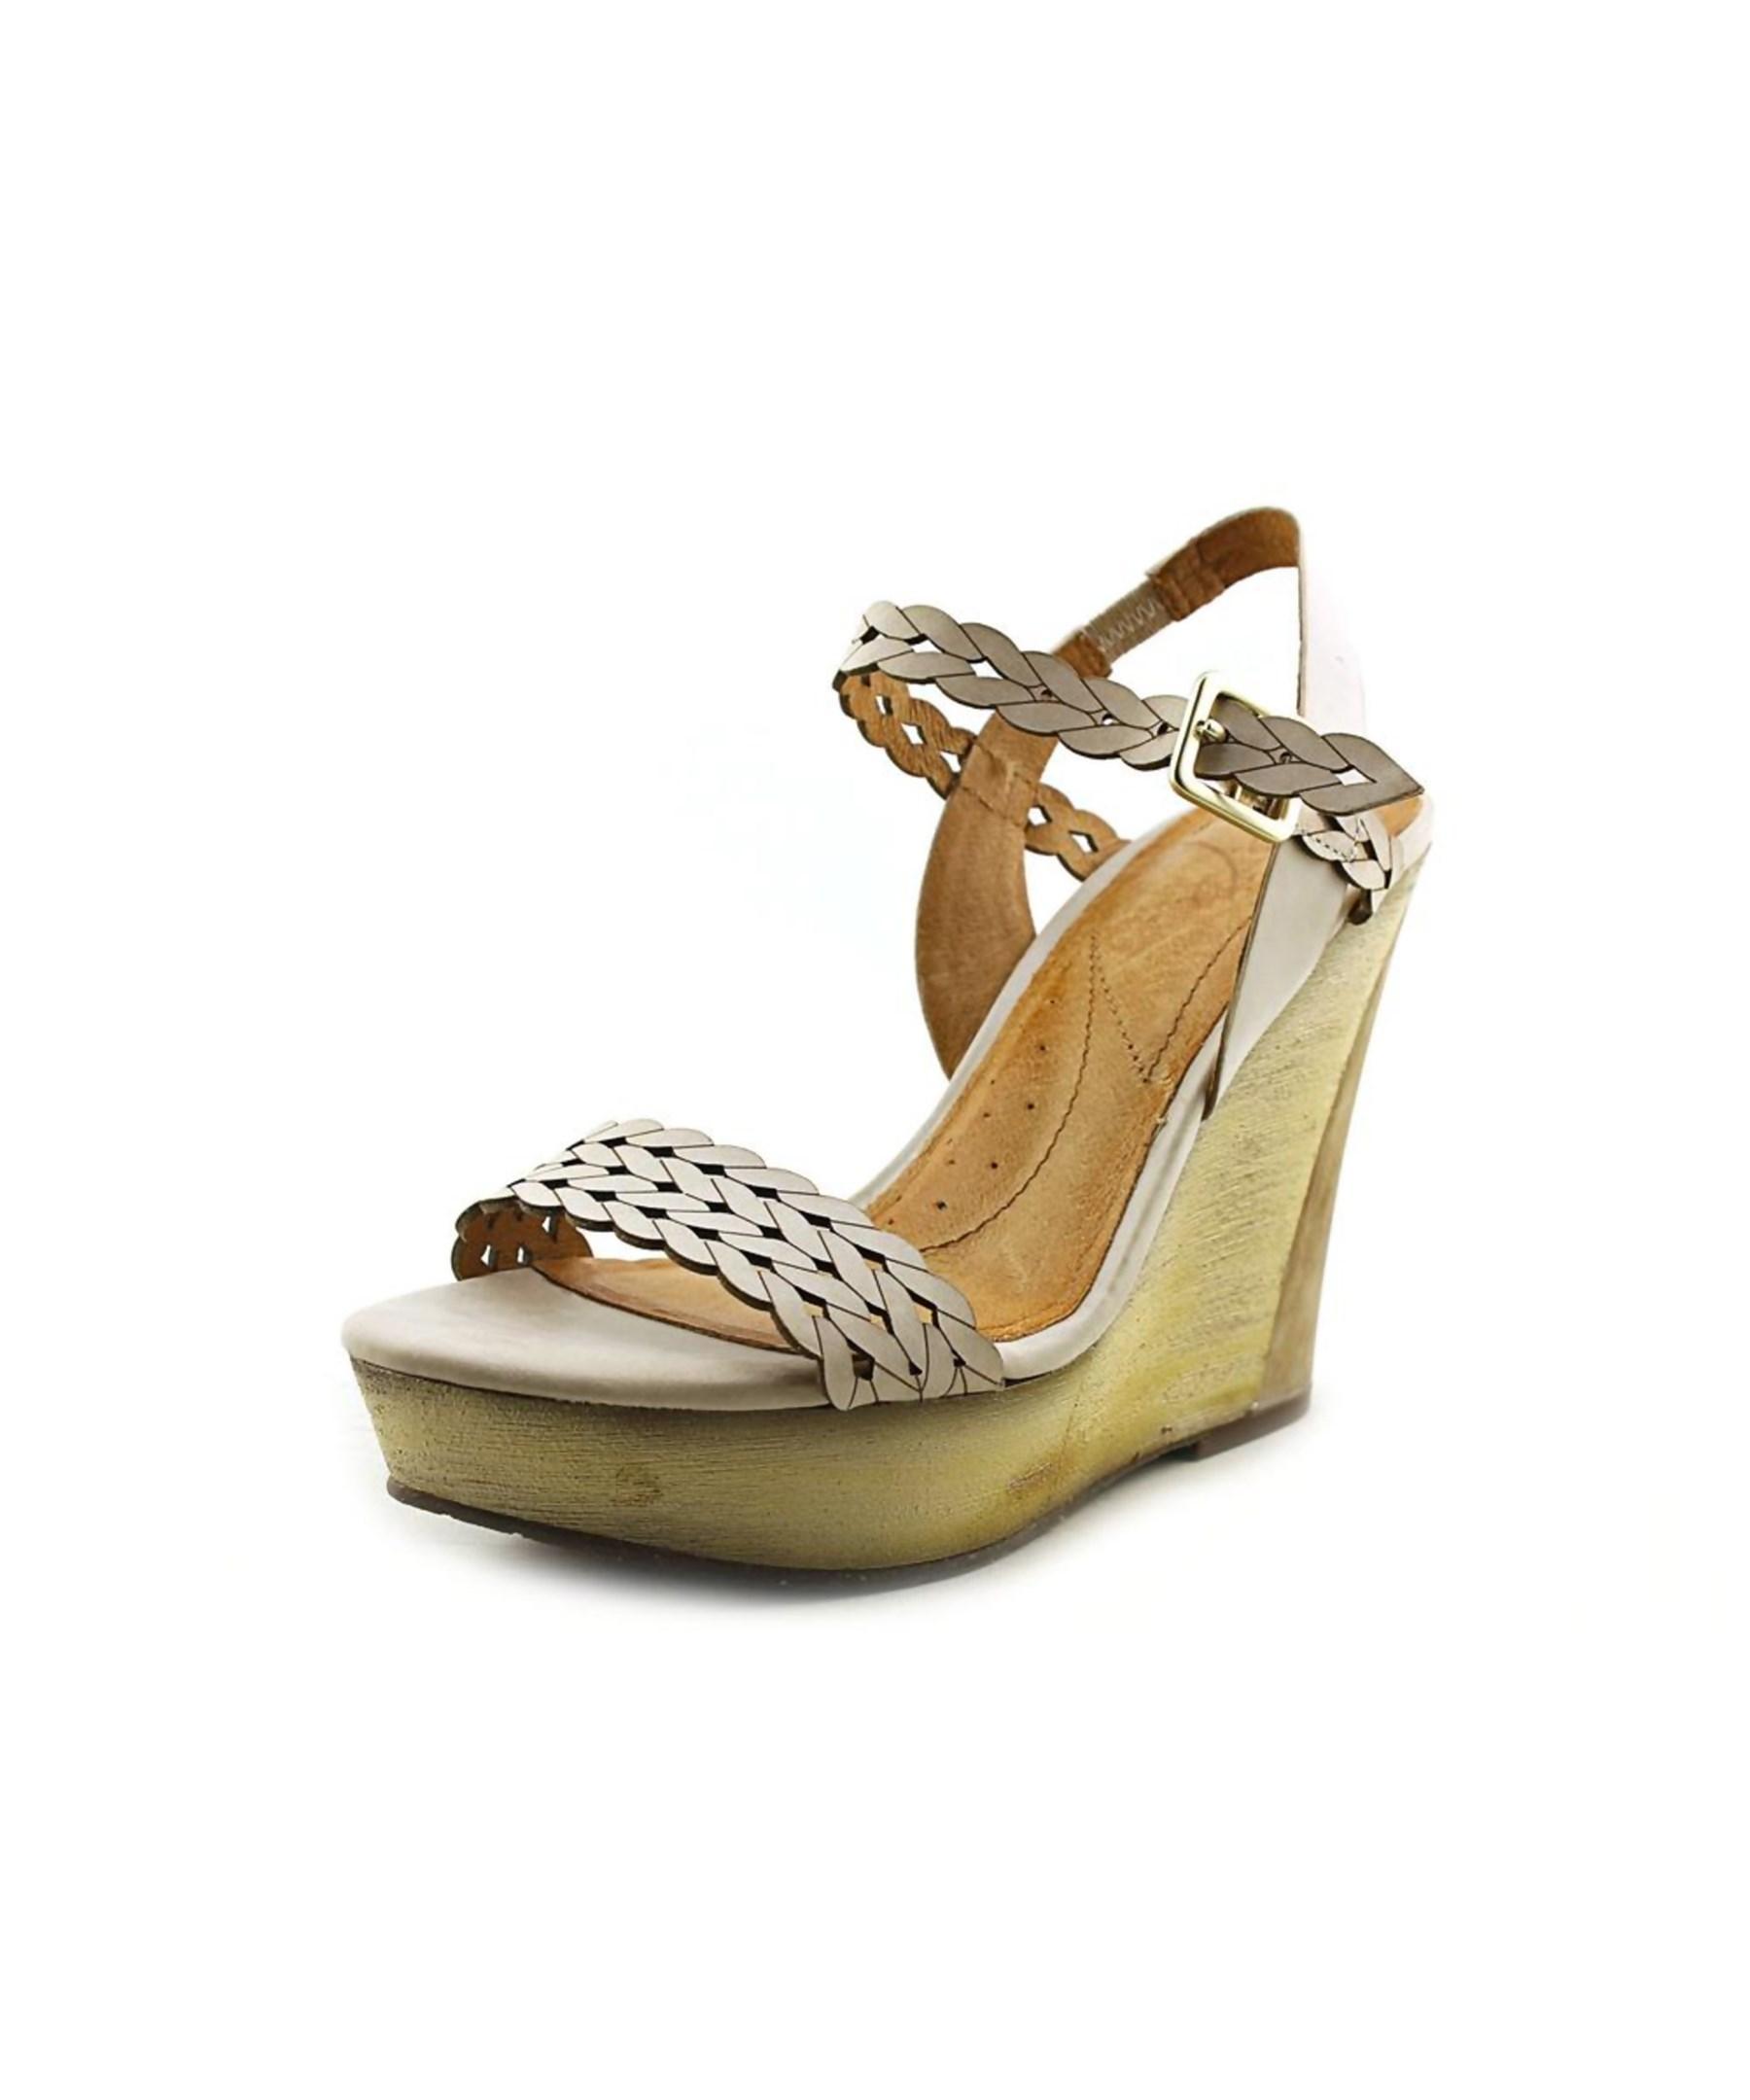 Naya Bellina Open Toe Leather Wedge Heel Lyst